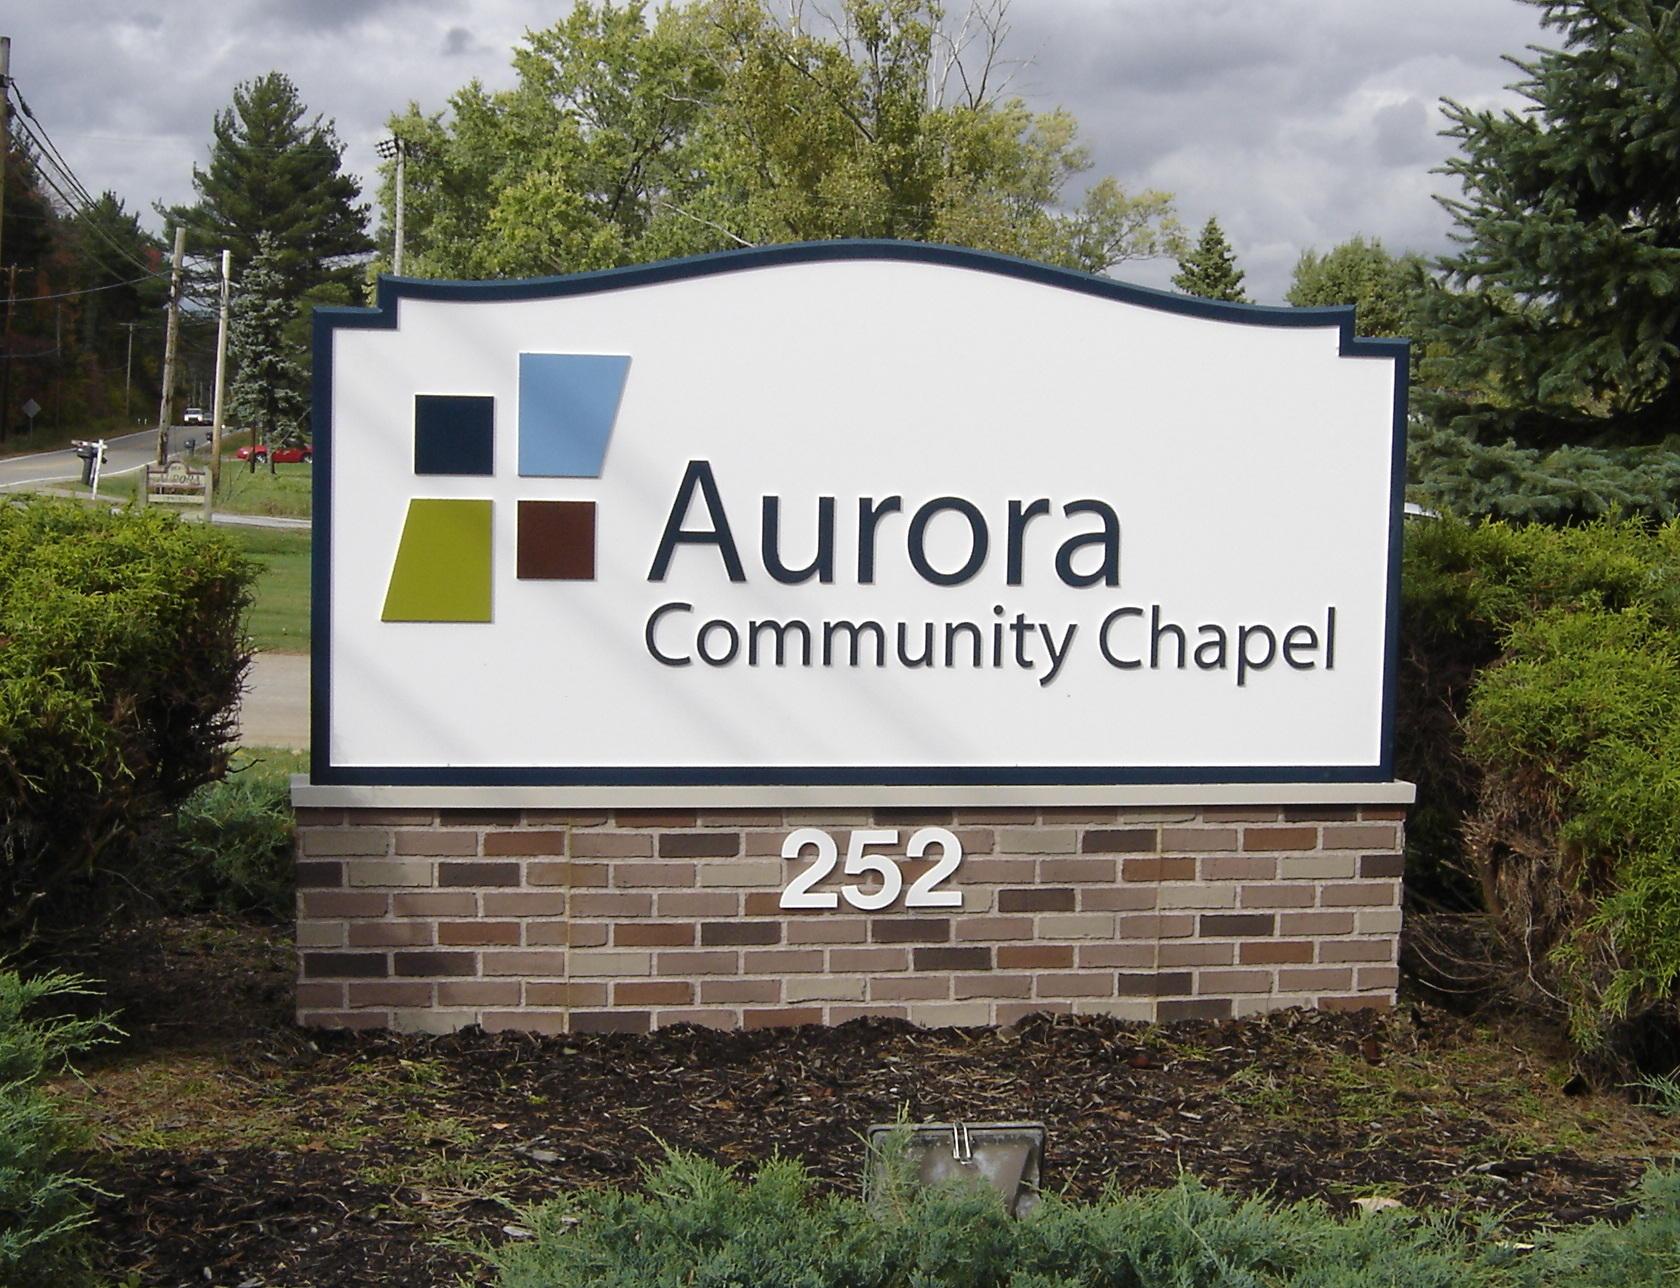 Aurora Community Chapel